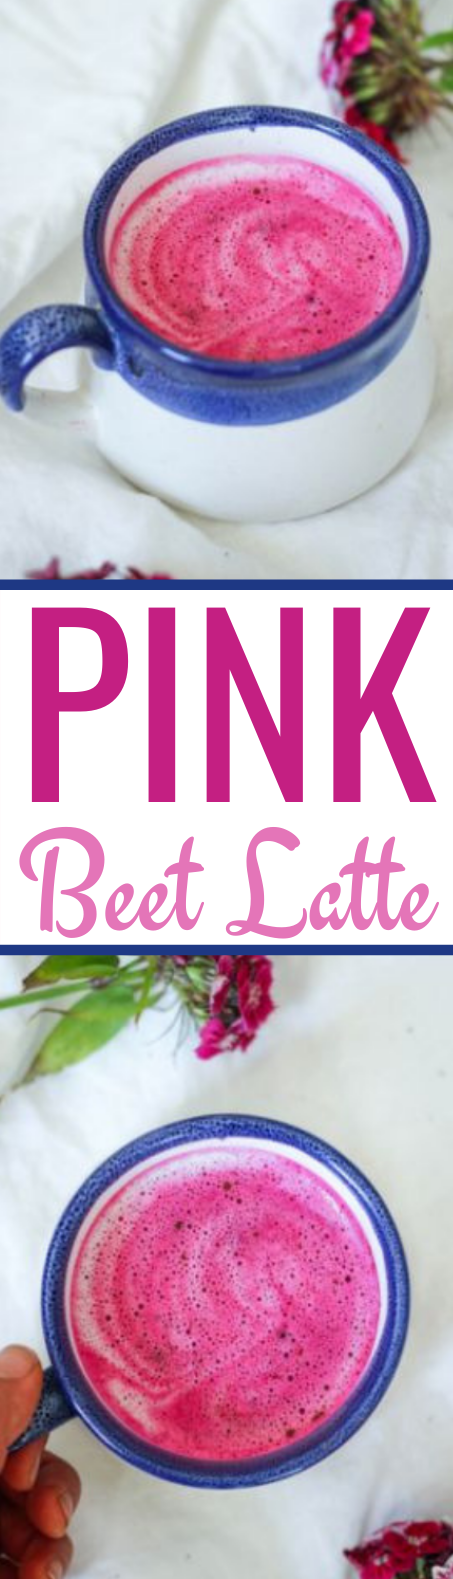 Pink Beet Latte (Paleo, Whole30, Vegan) #healthy #drinks #latte #paleo #vegan